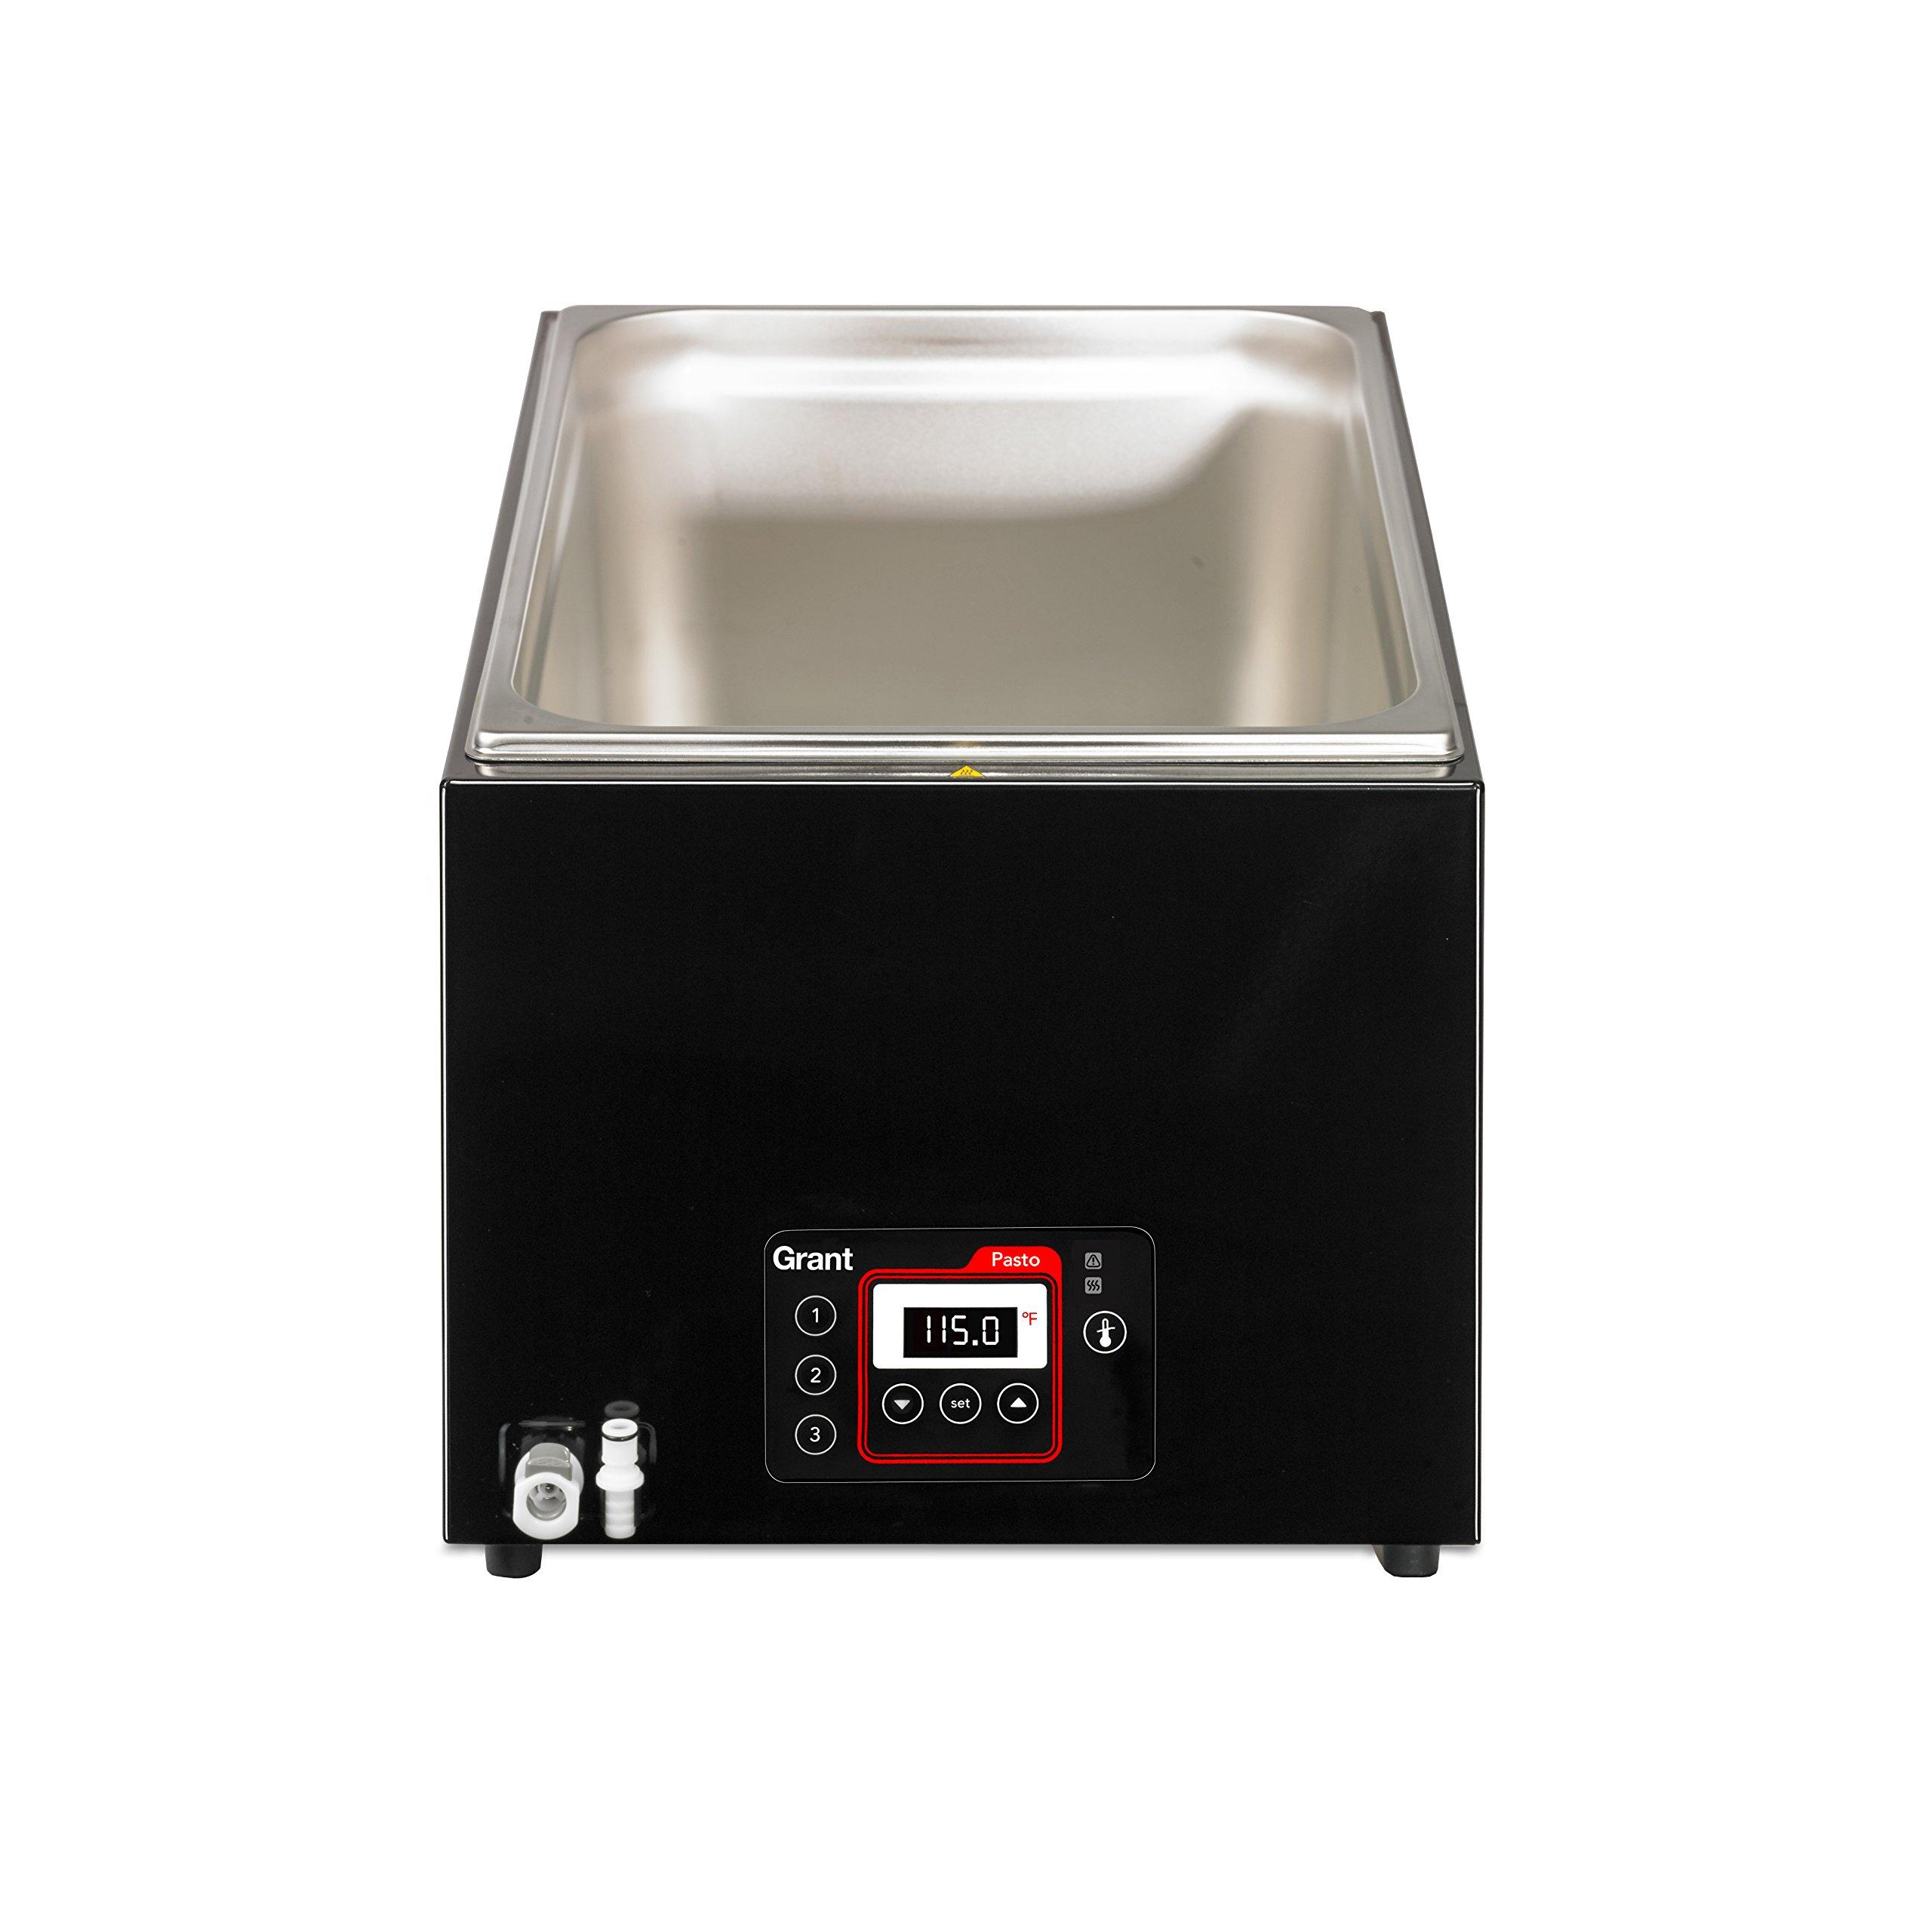 Creative Cuisine By Grant Professional Pasto Sous Vide Water Bath, Black, 12L